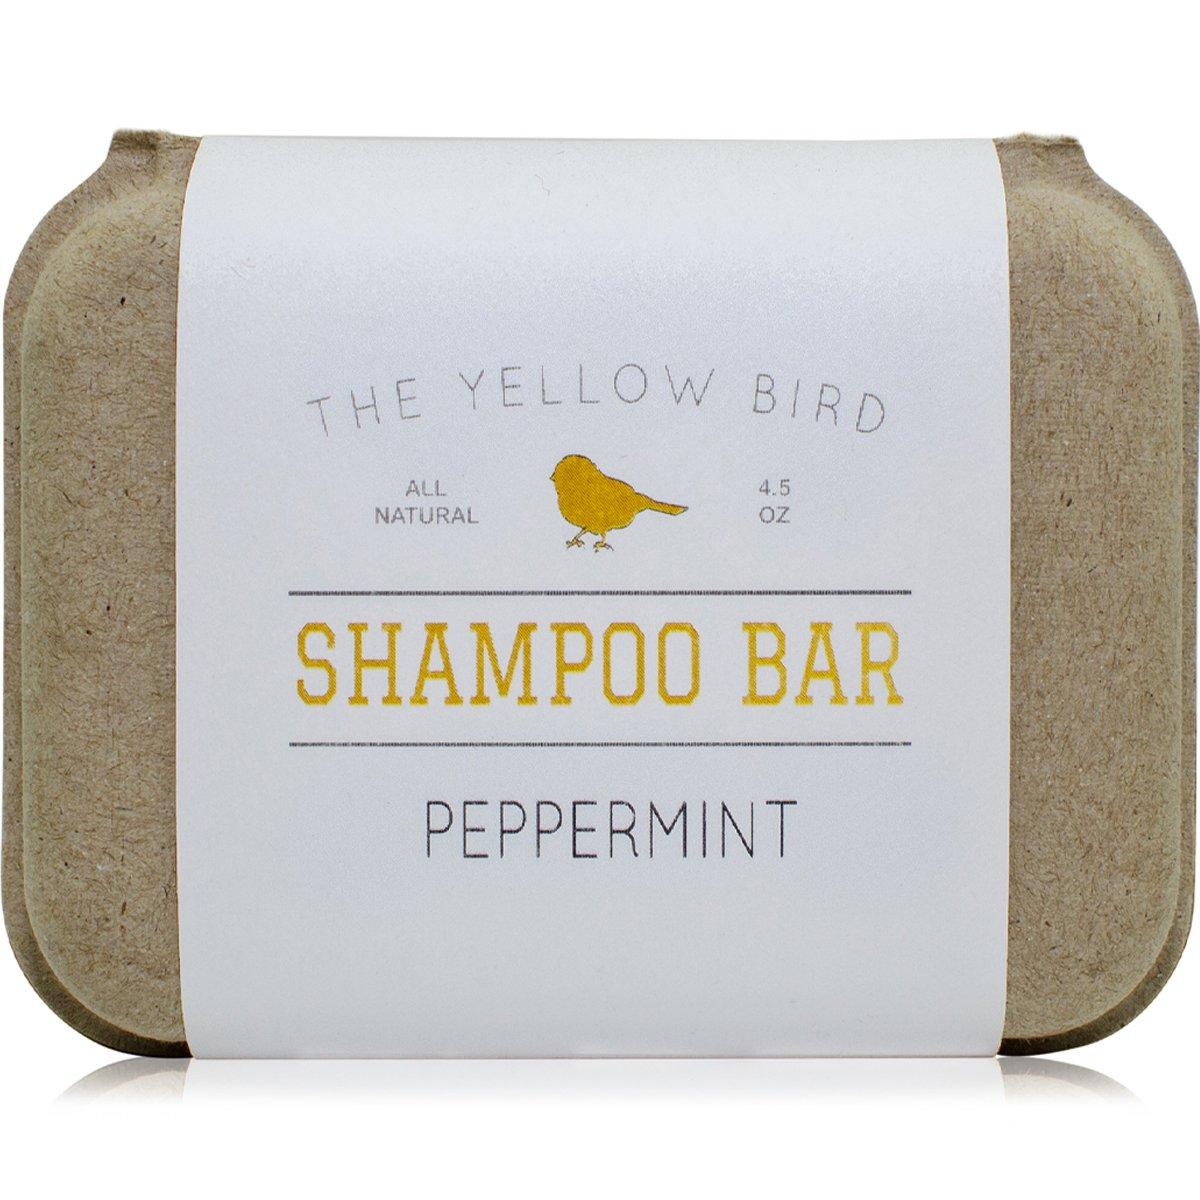 Best Zero Waste Shampoo & Conditioner Bars - Yellow Bird